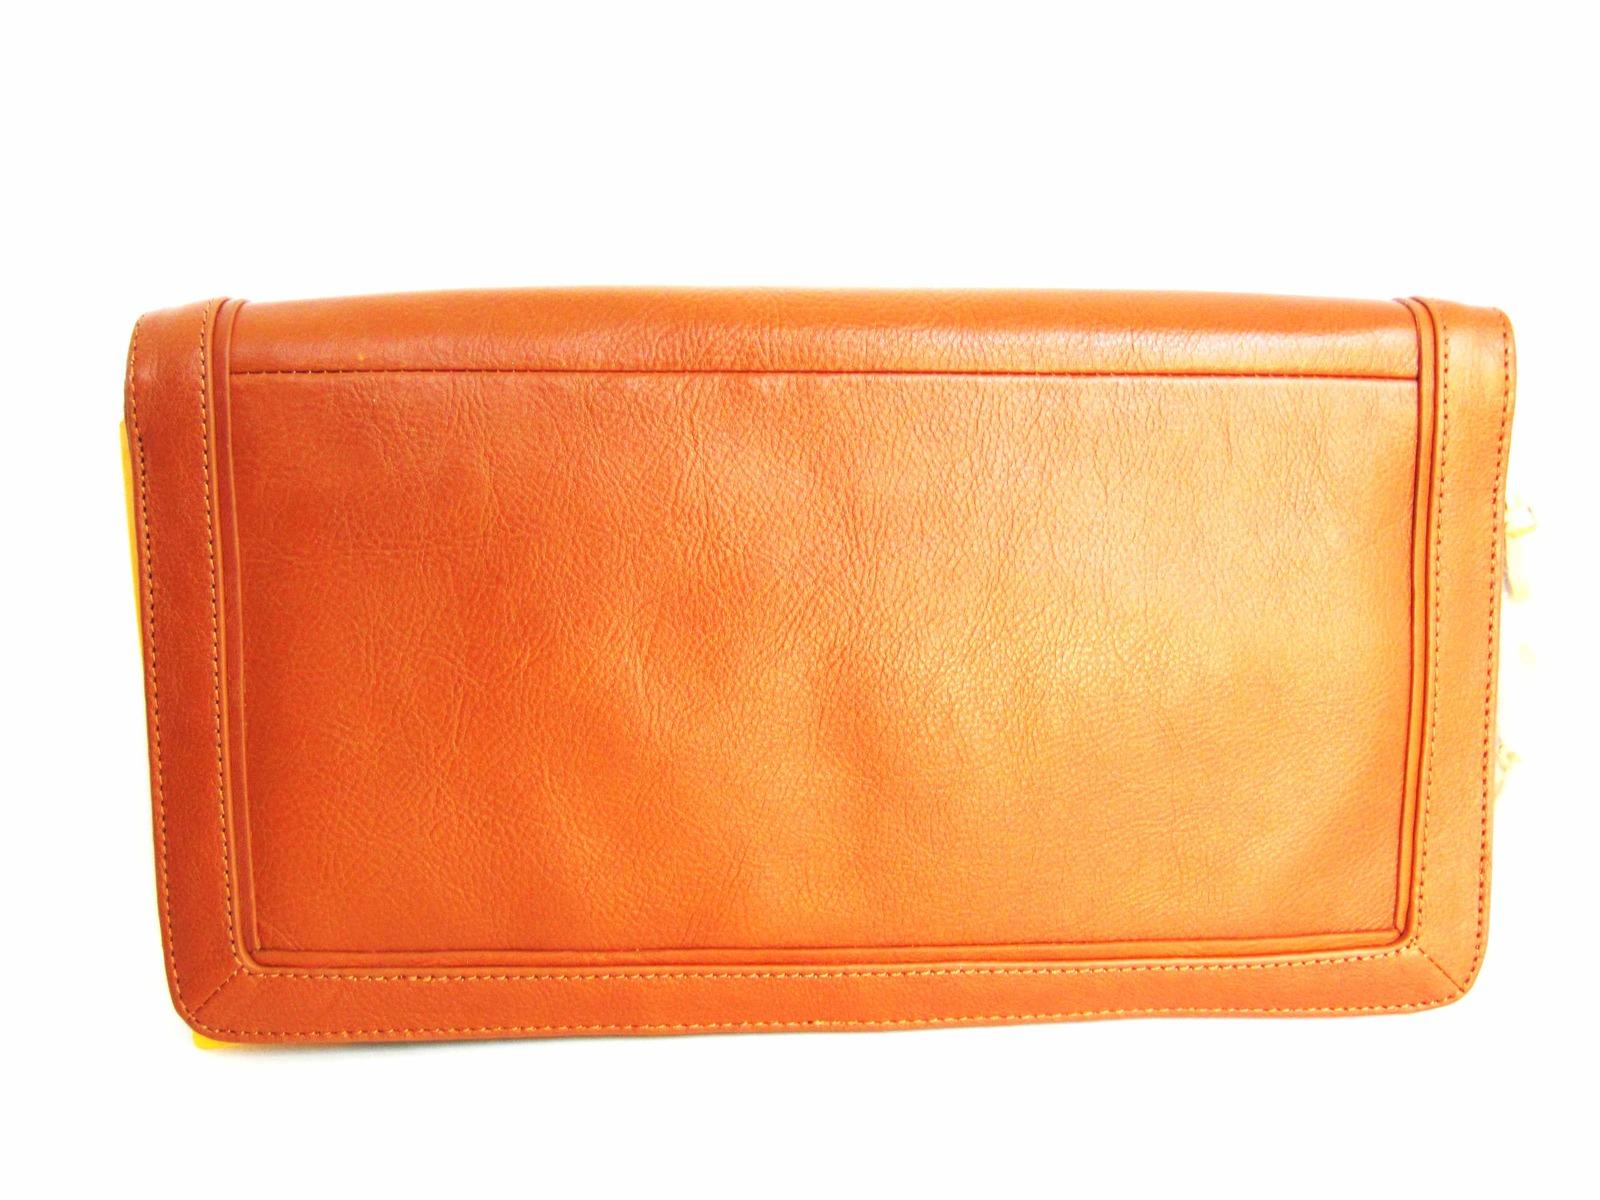 Tory Burch SUKI REVA Clutch Purse Shoulder Handbag Brown image 3